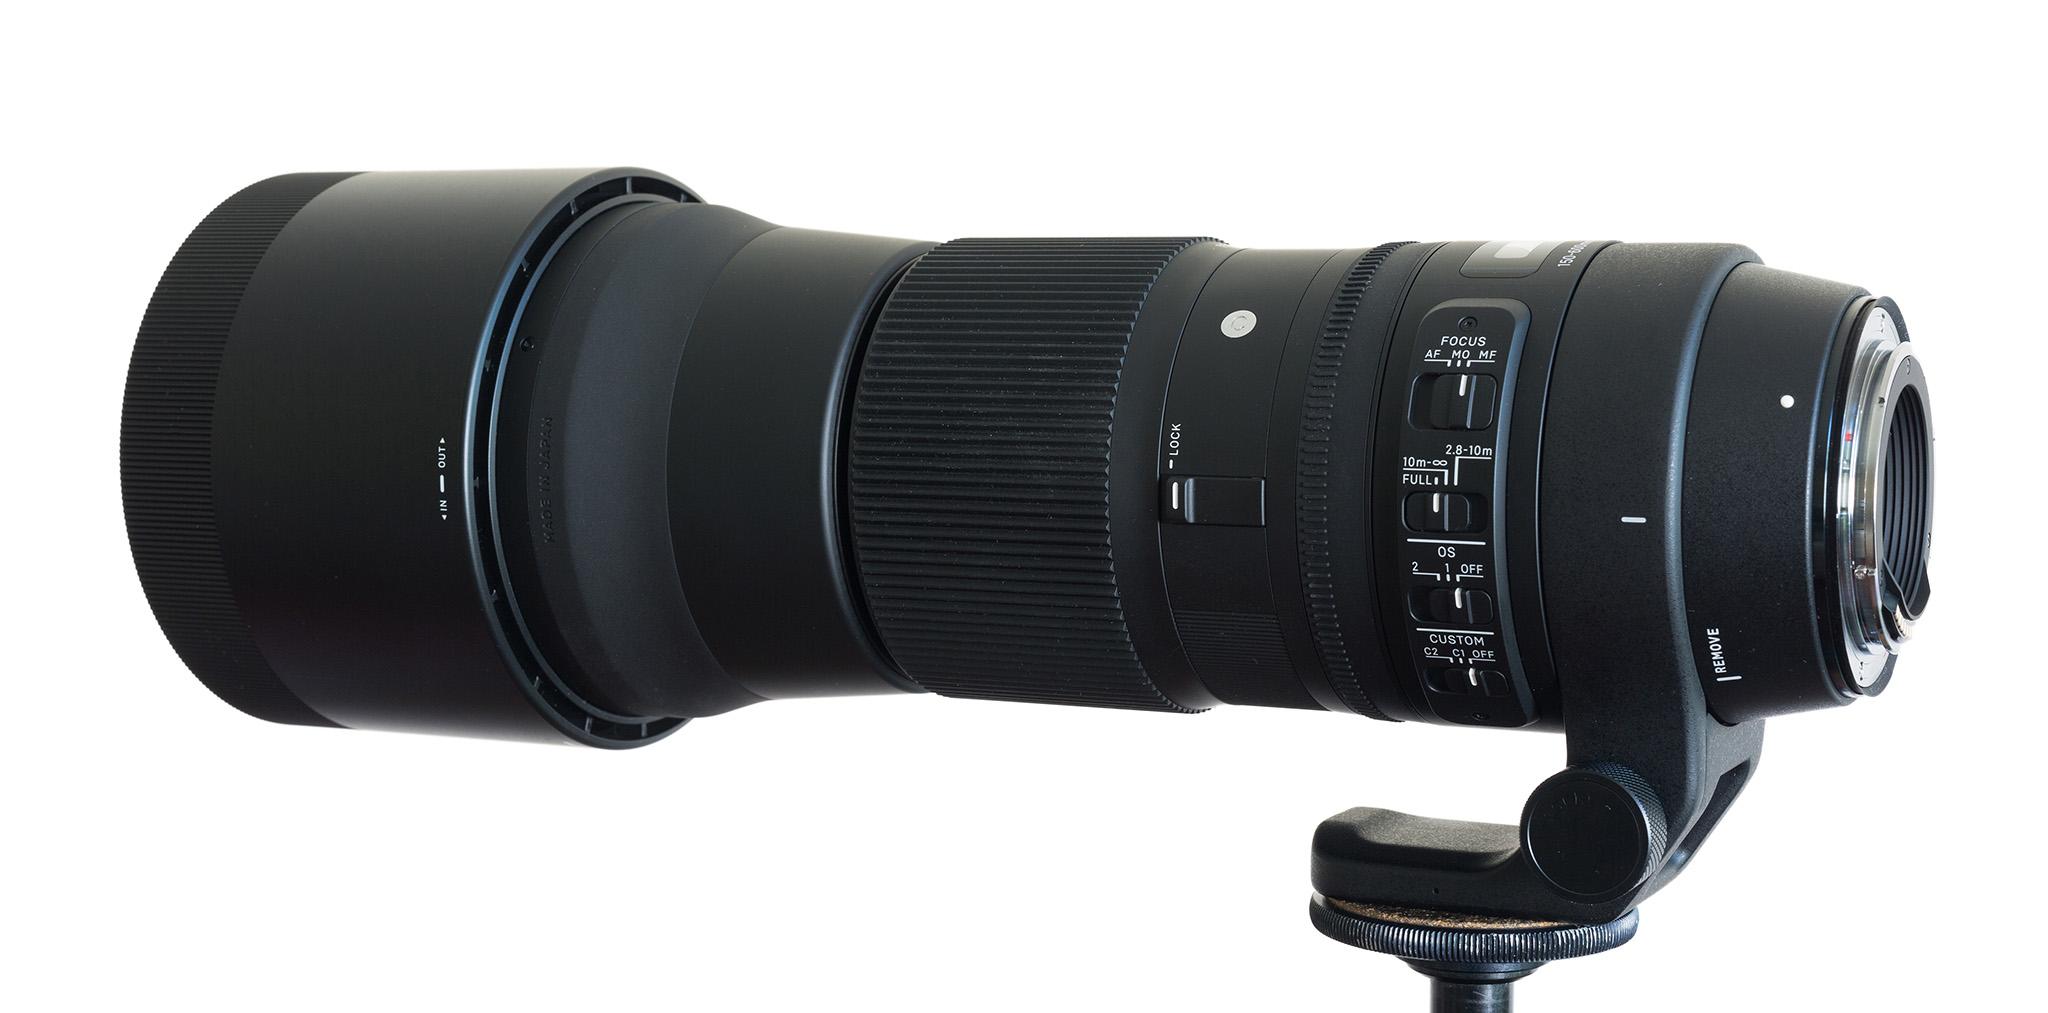 sigma_150-600mm_f5-f6-3_dg_os_hsm_c_lens_1_-_diliff